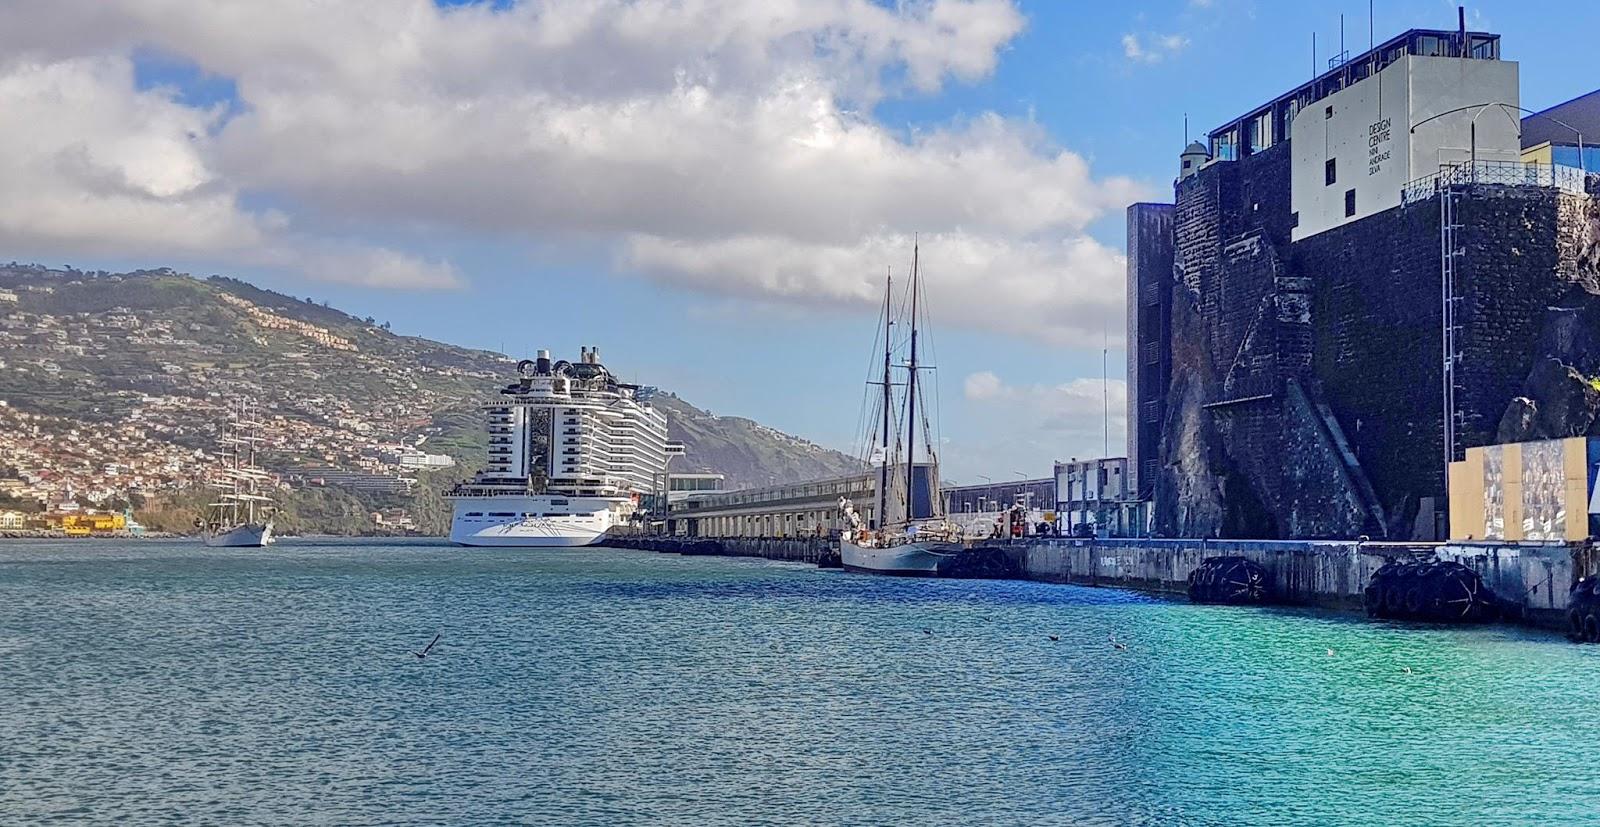 harmonia no Porto do Funchal